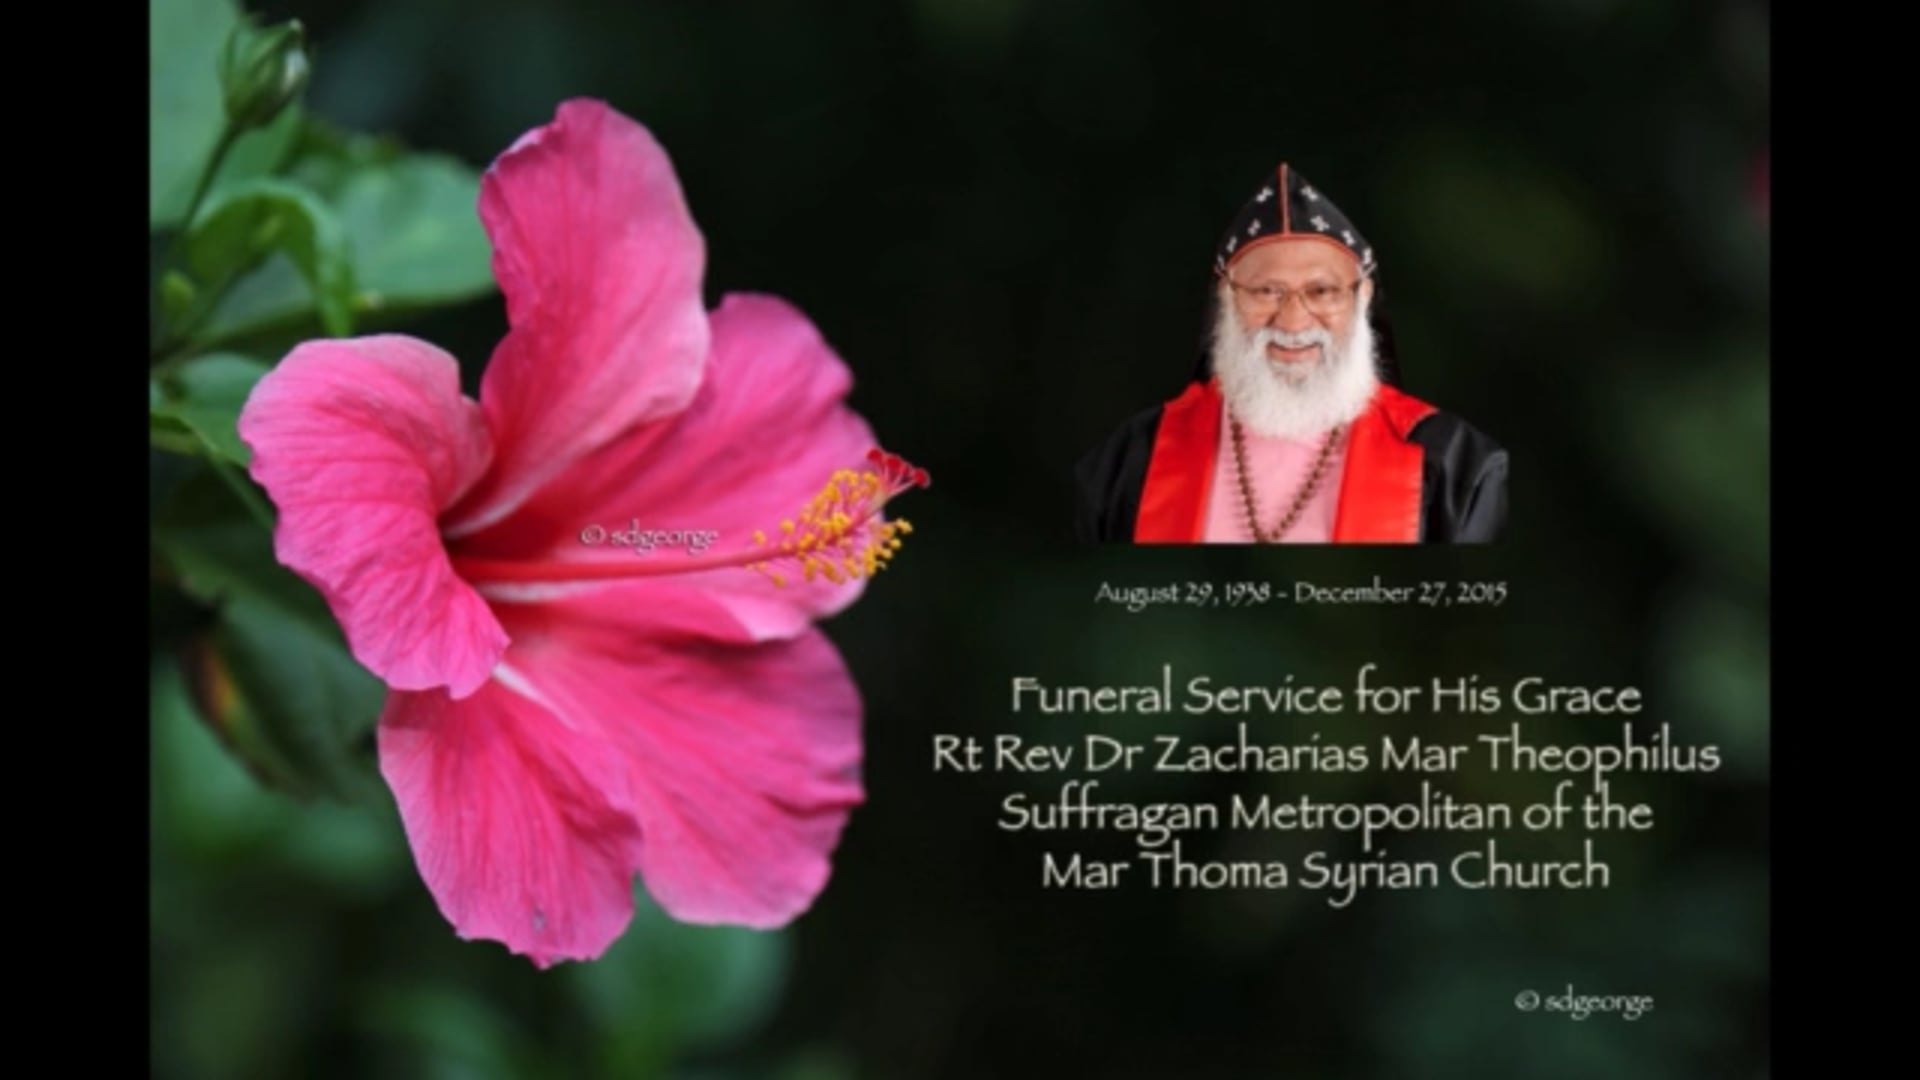 Funeral Service for His Grace Rt. Rev. Dr. Zacharias Mar Theophilus Suffragan Metropolitan